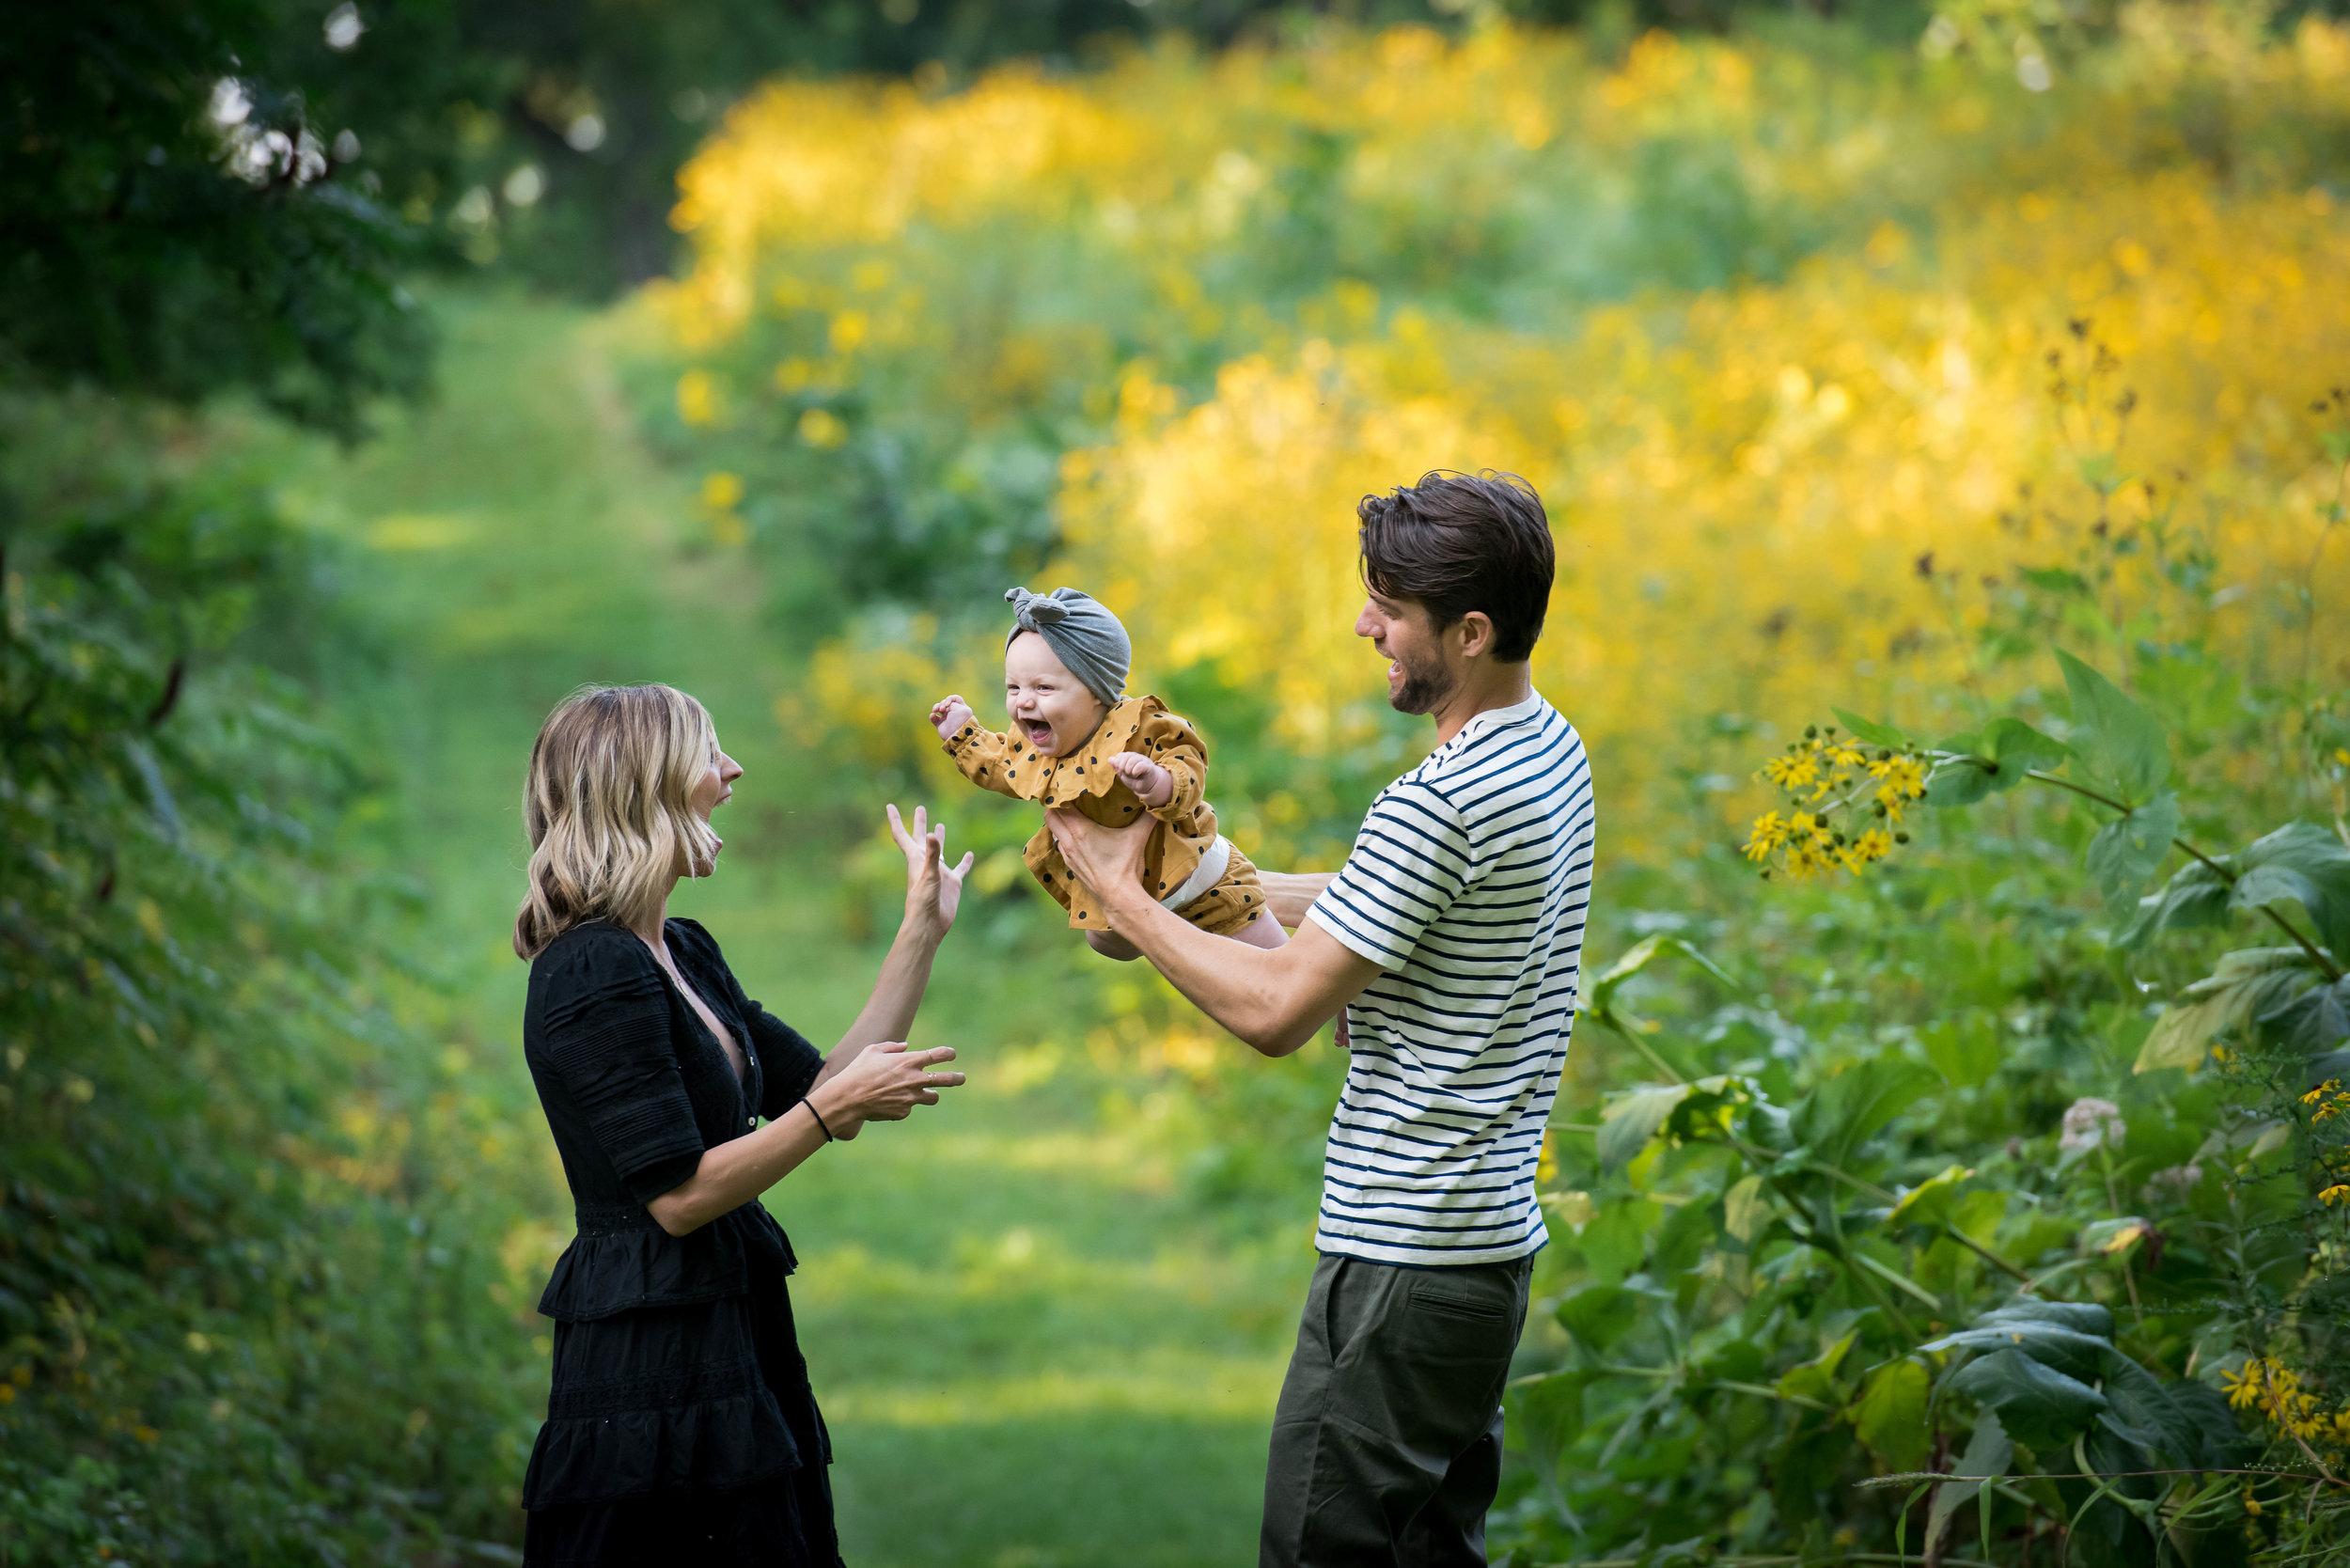 FamilyPhotography-JuliaMatthews-31.jpg